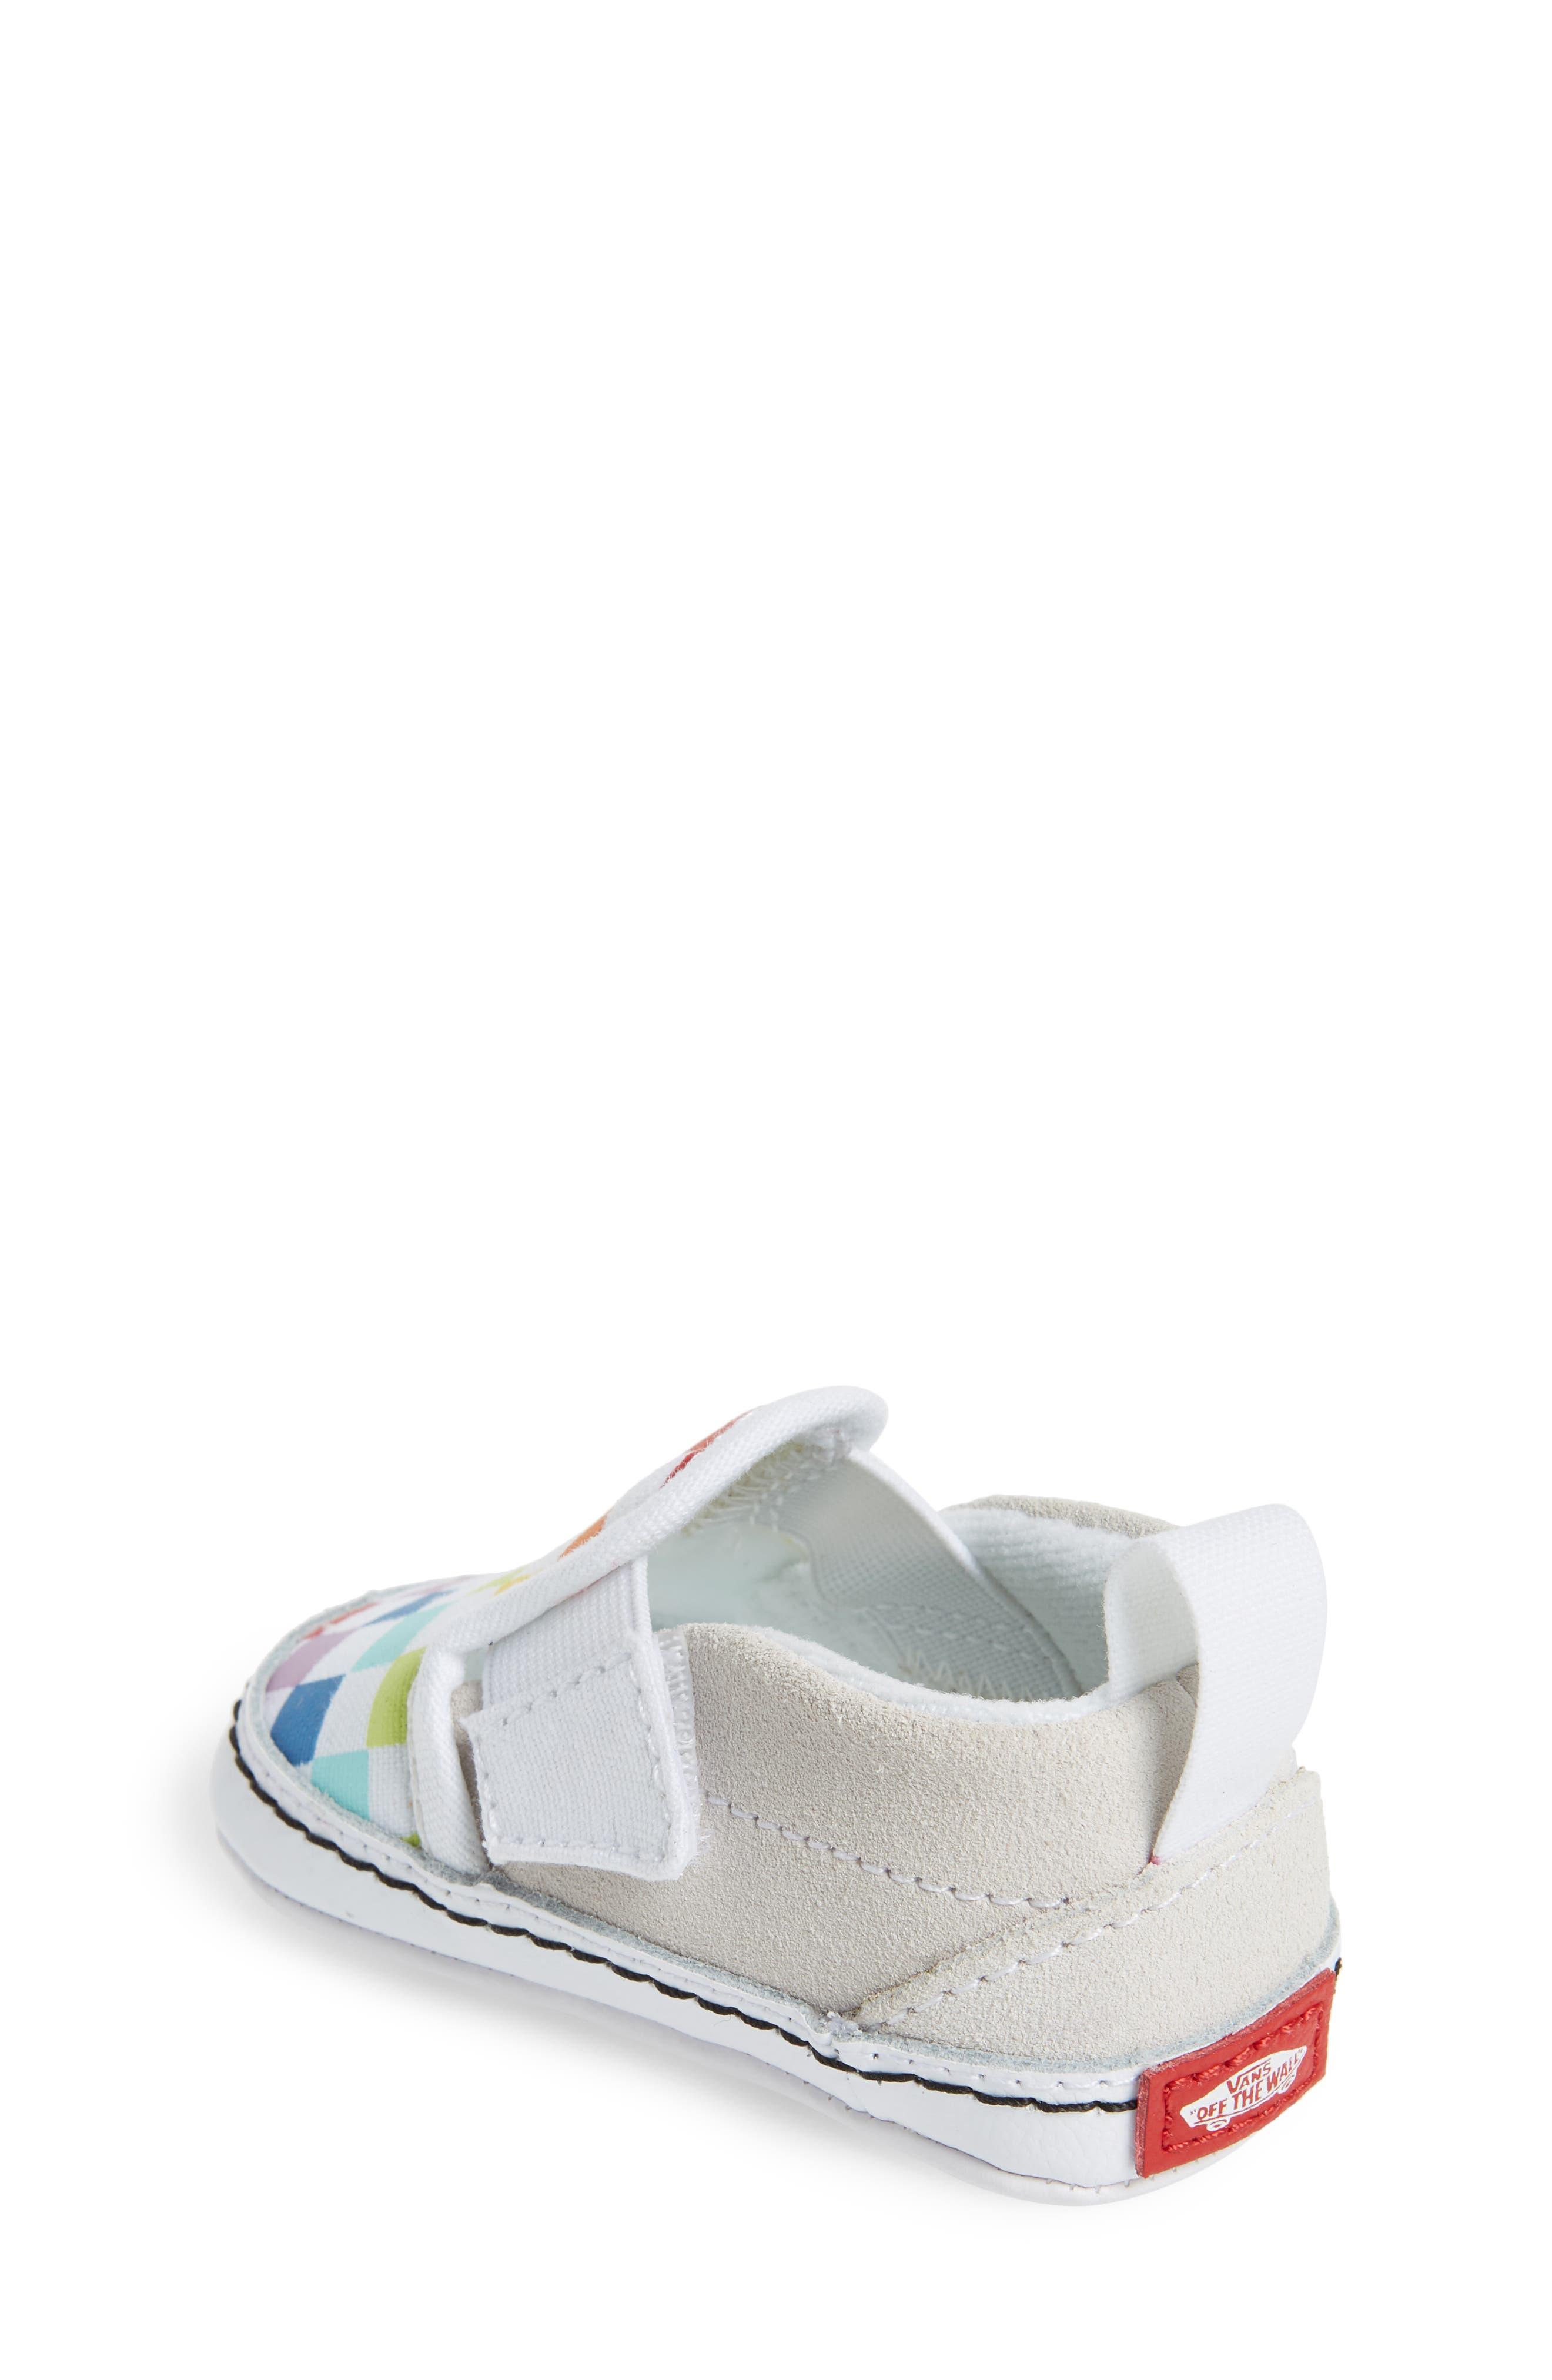 Slip-On Crib Shoe,                             Alternate thumbnail 2, color,                             Checkerboard Rainbow/ White